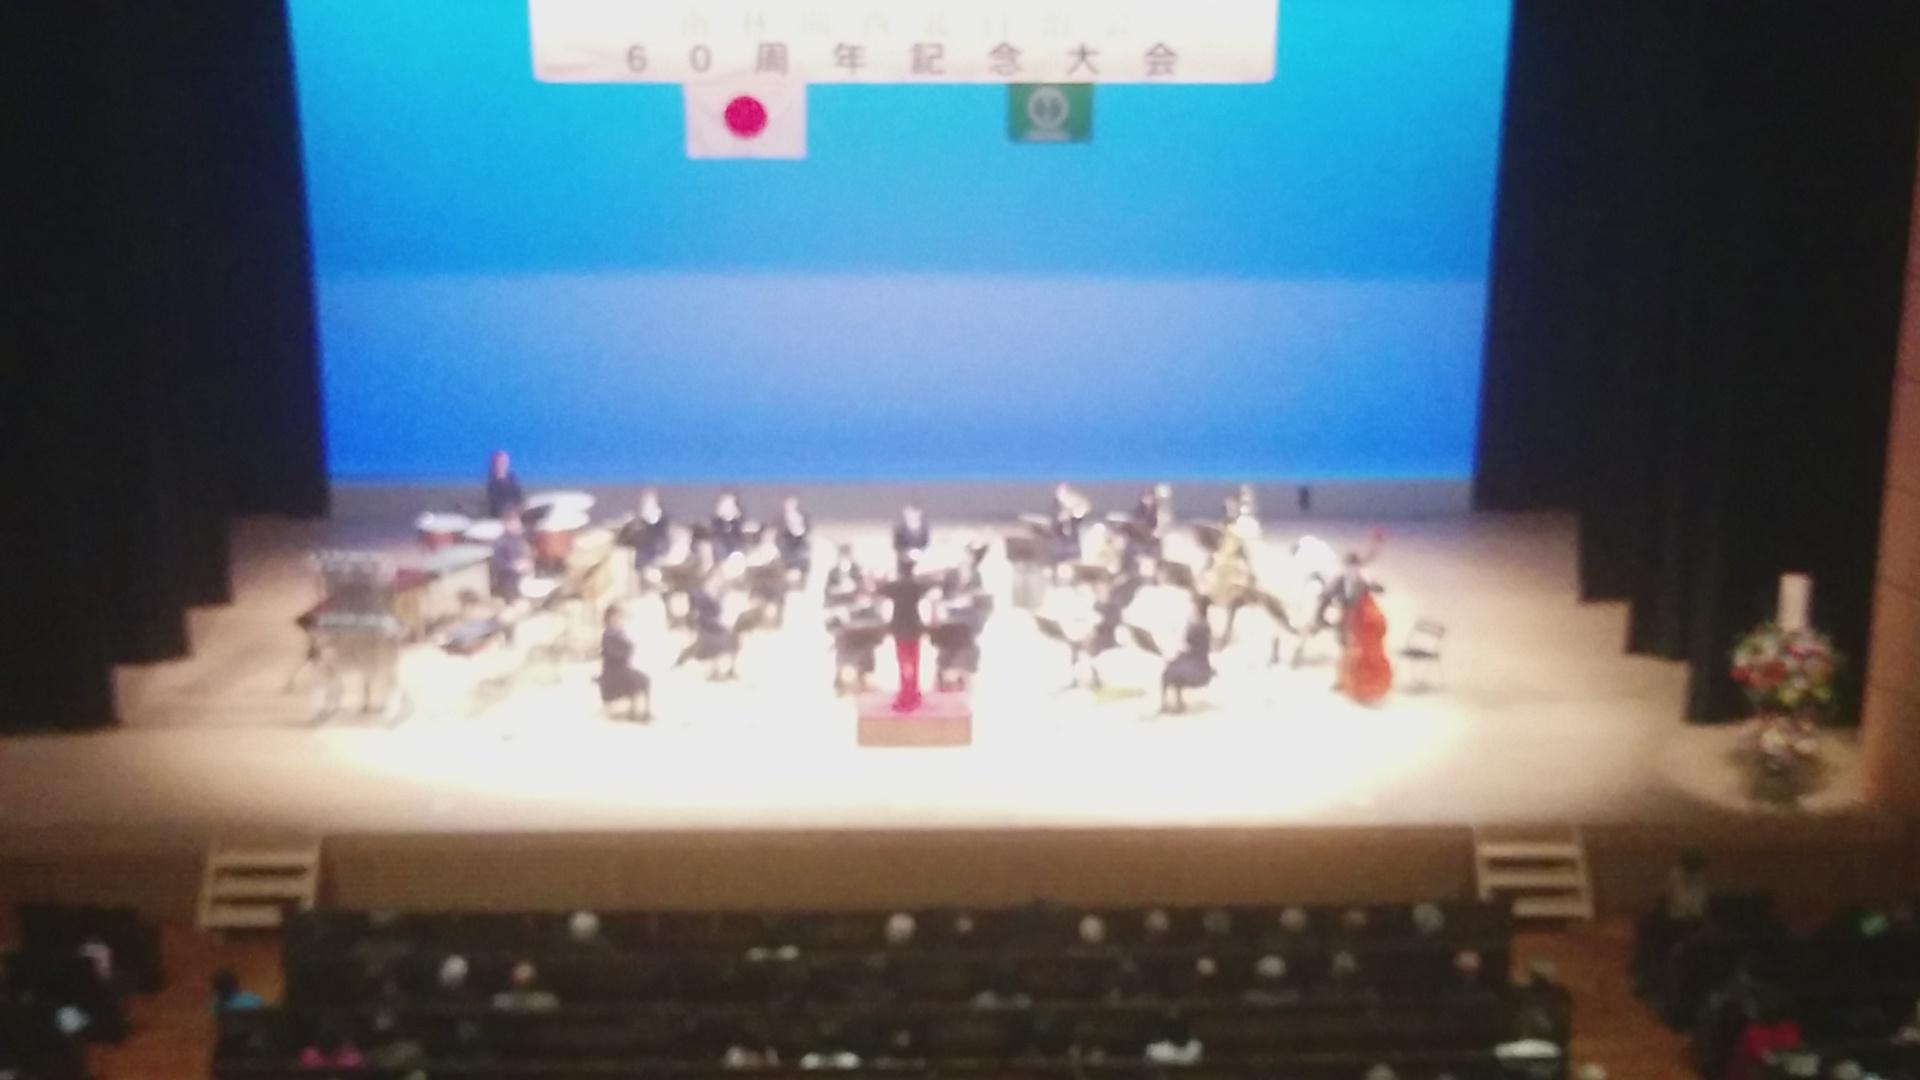 5 Yamato Nishi's brass band (they were good)